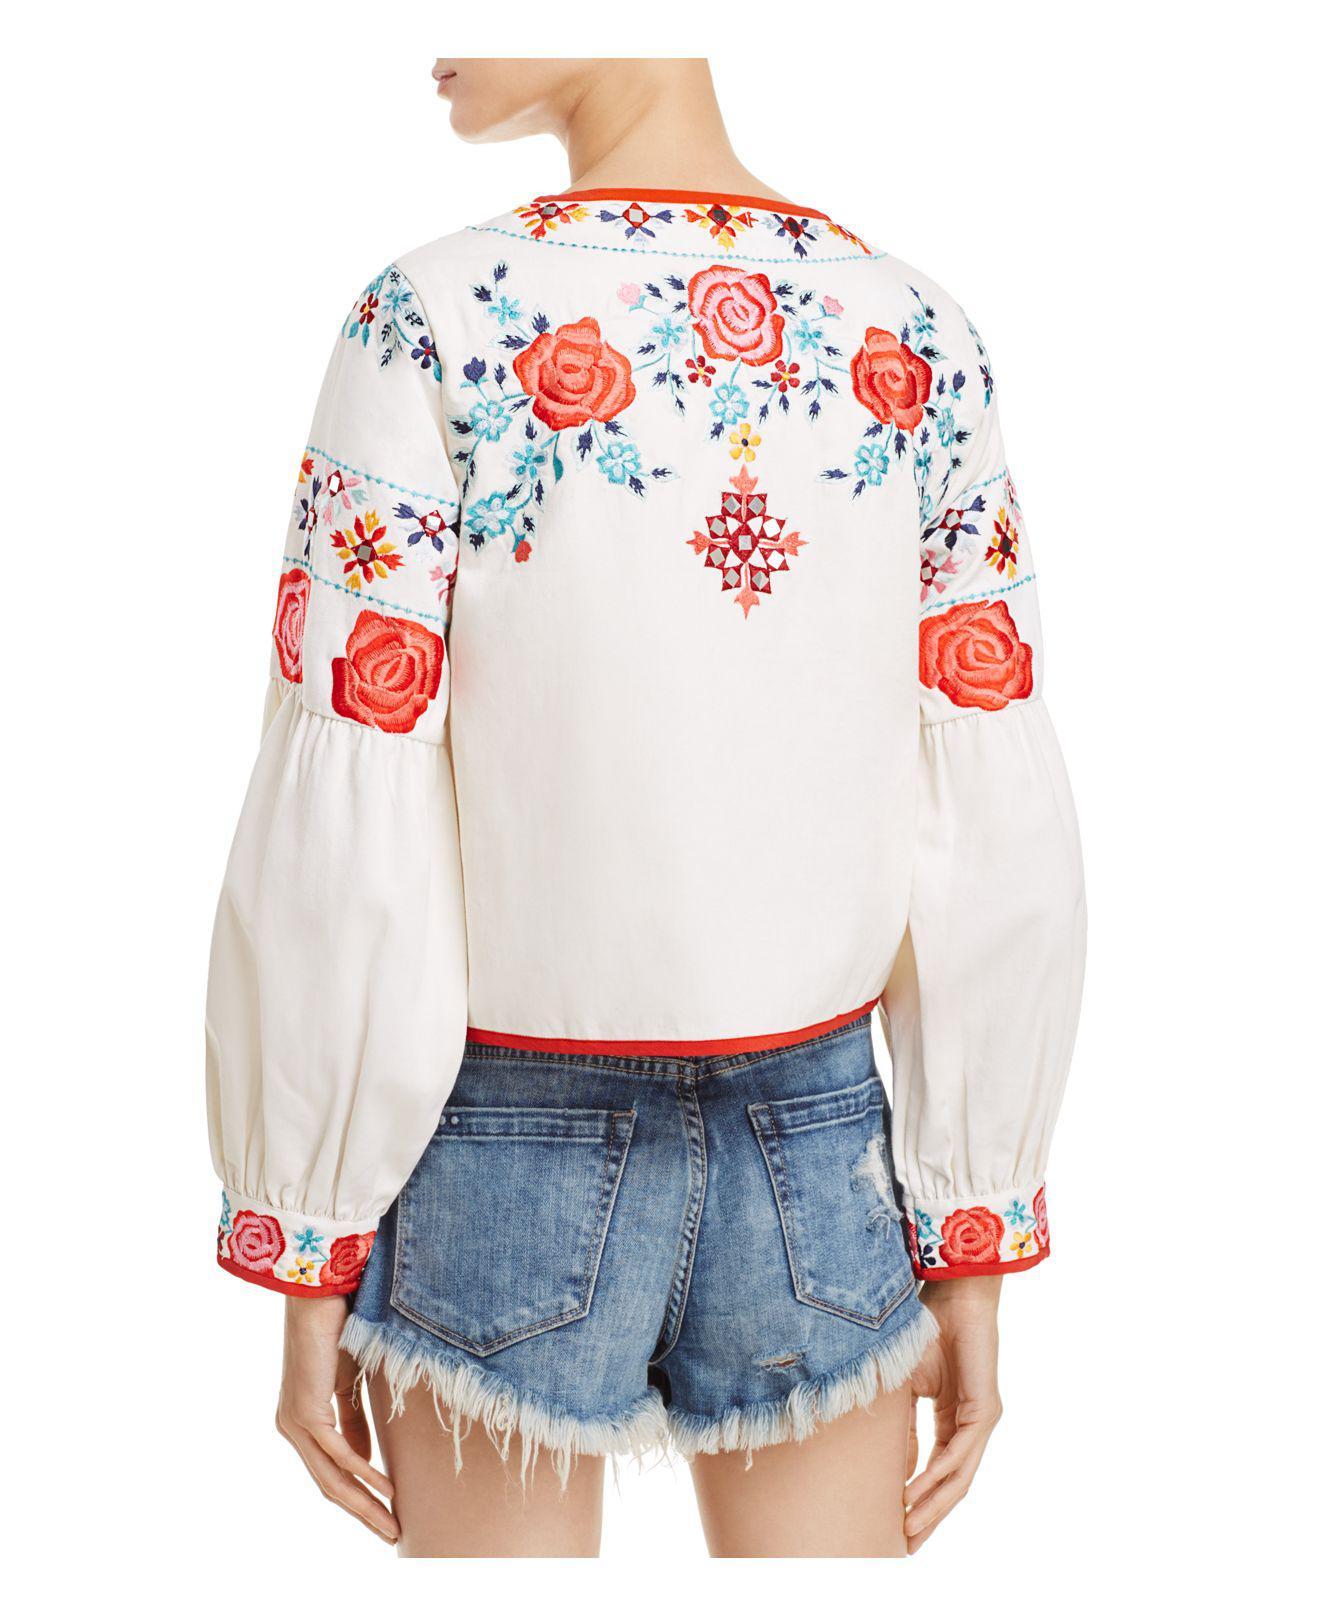 Lyst misa valentina embroidered jacket in white